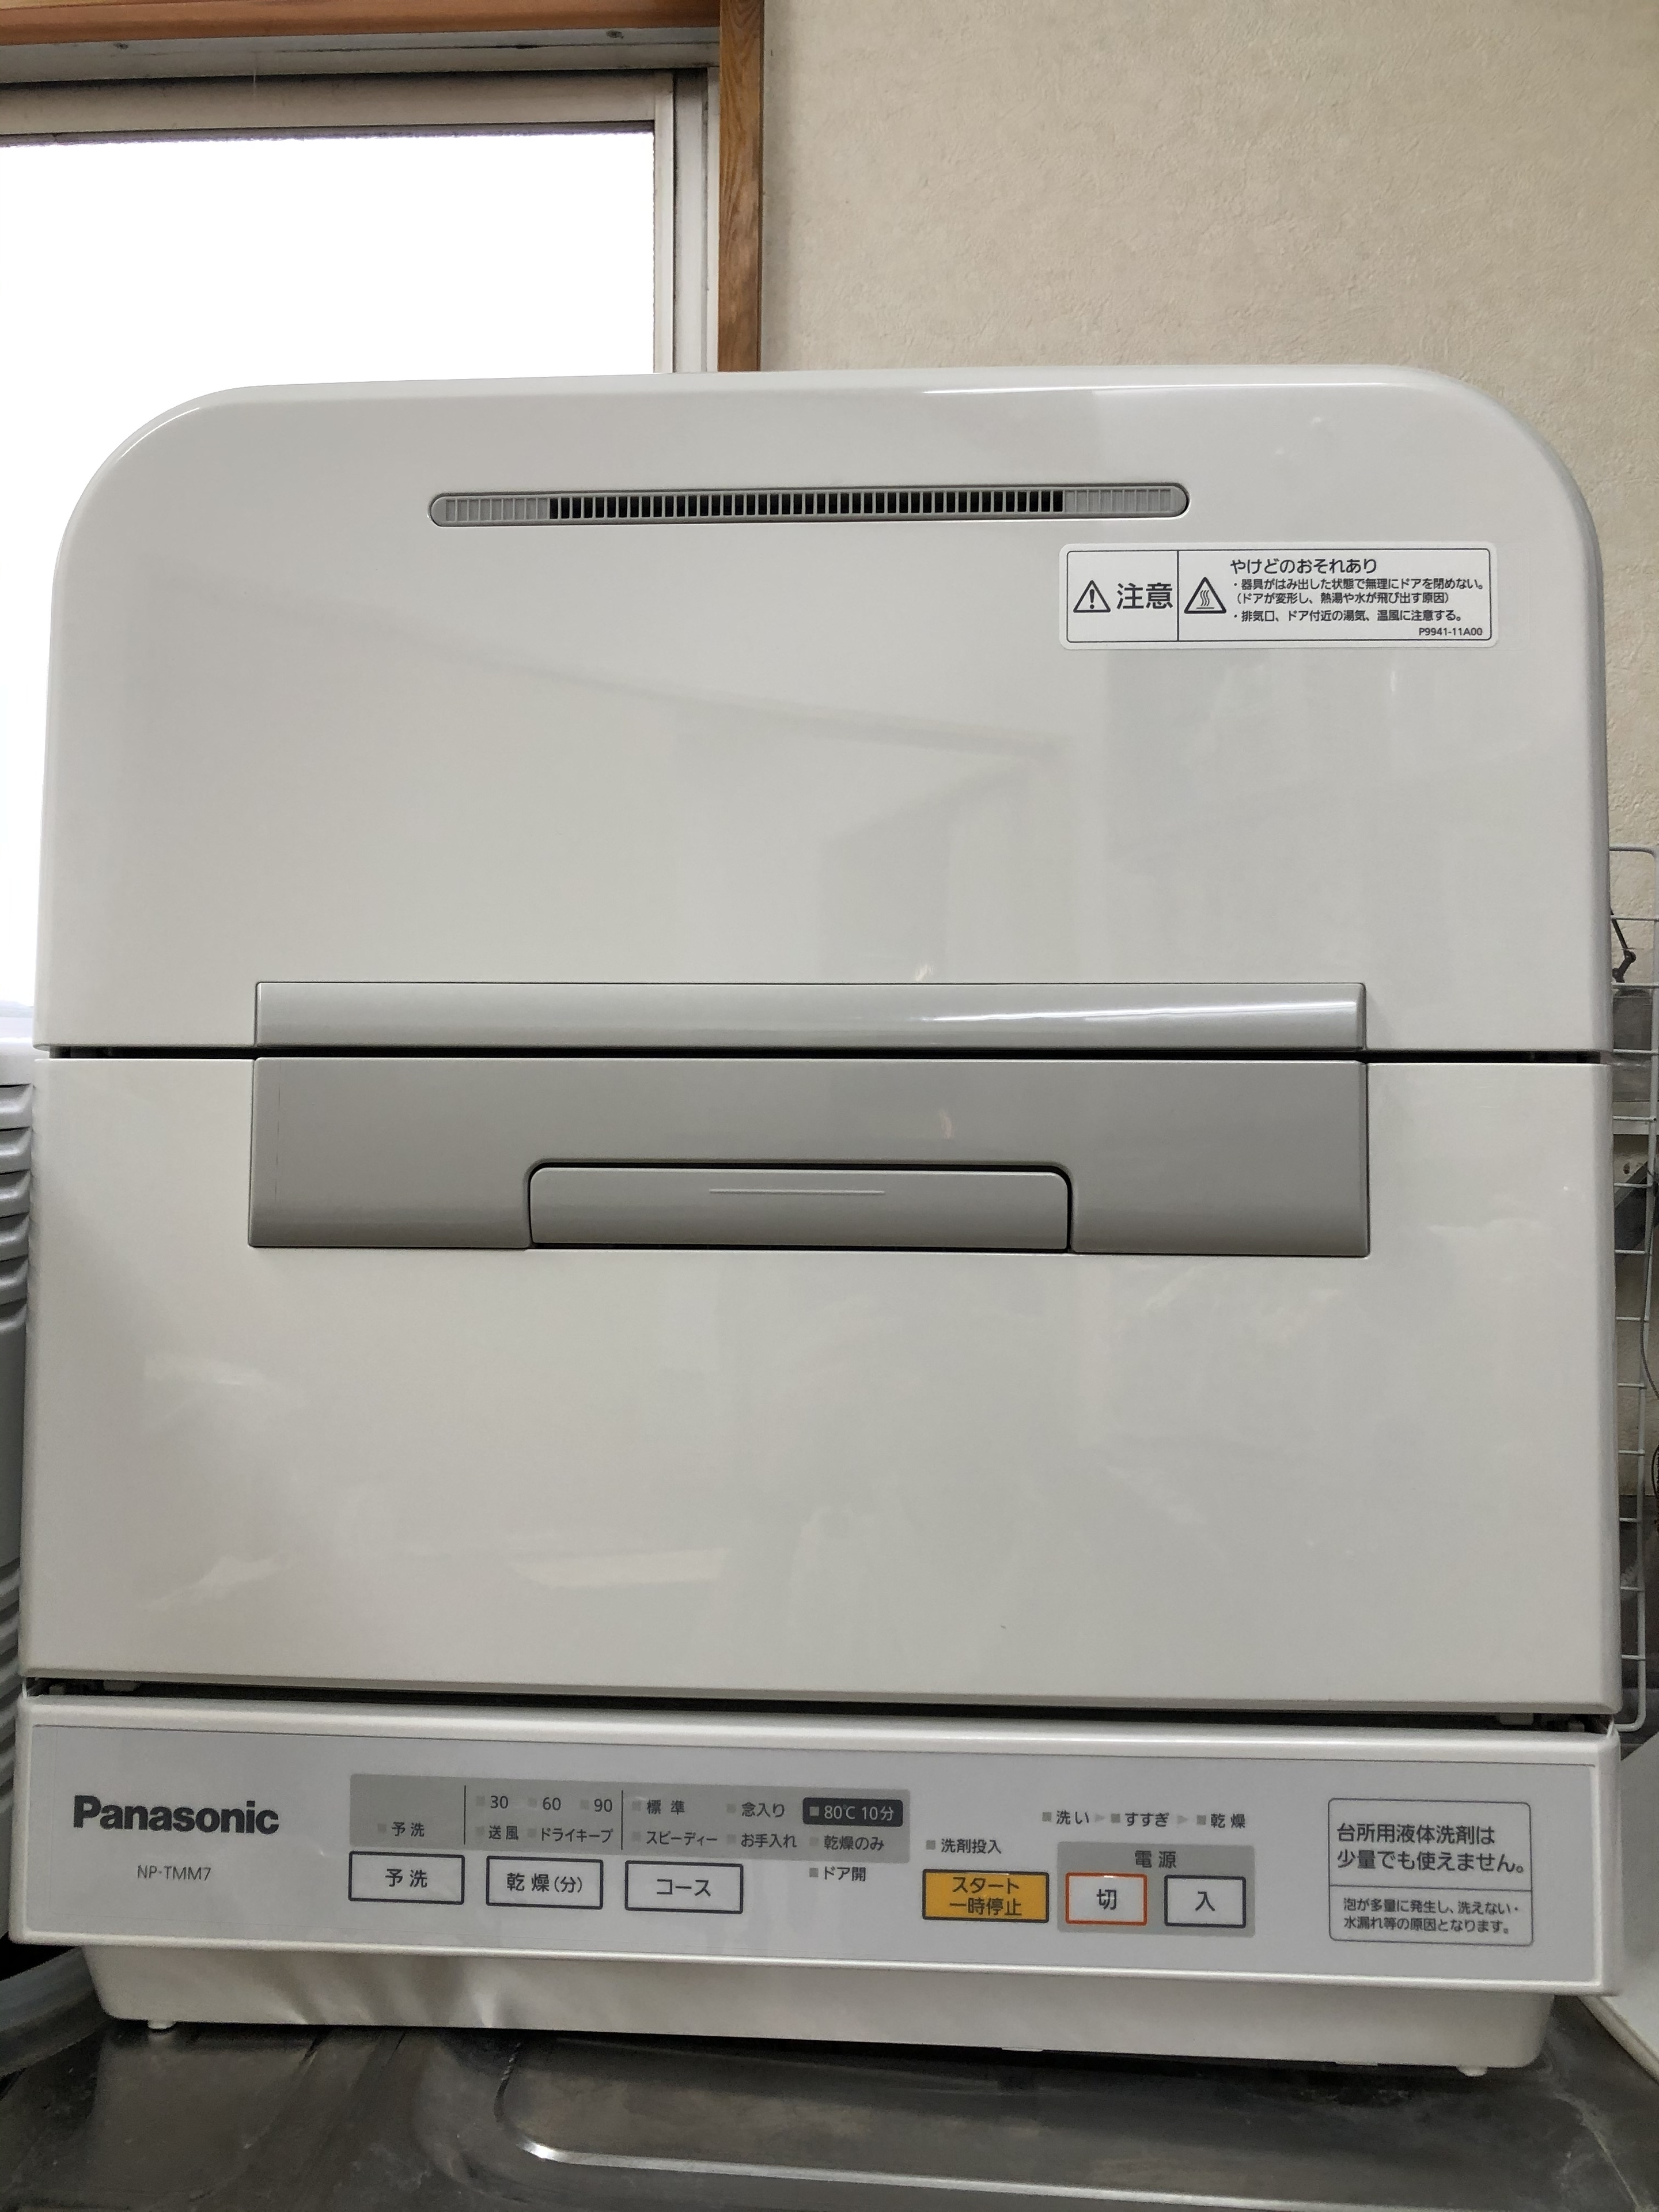 R20901